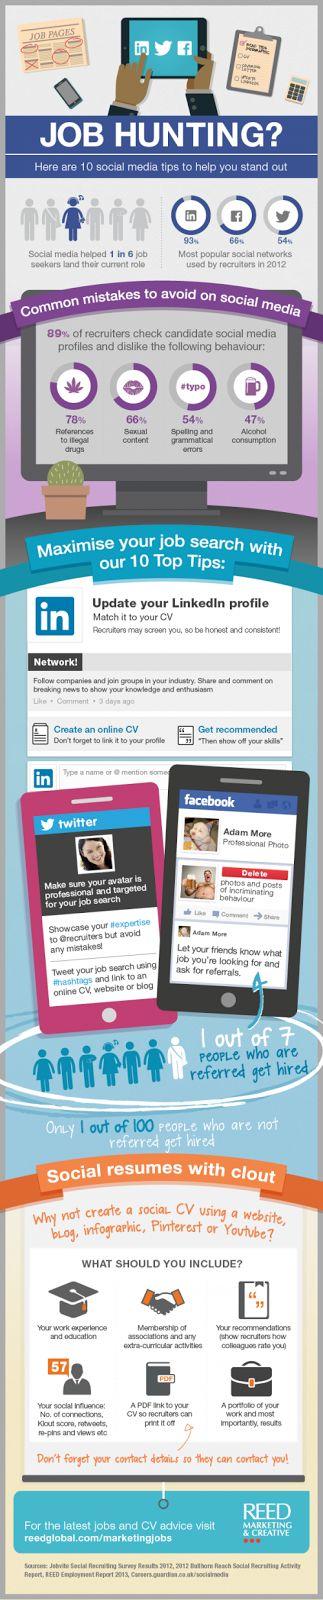 309 best images about Goodwill Job Seeker Tips on Pinterest